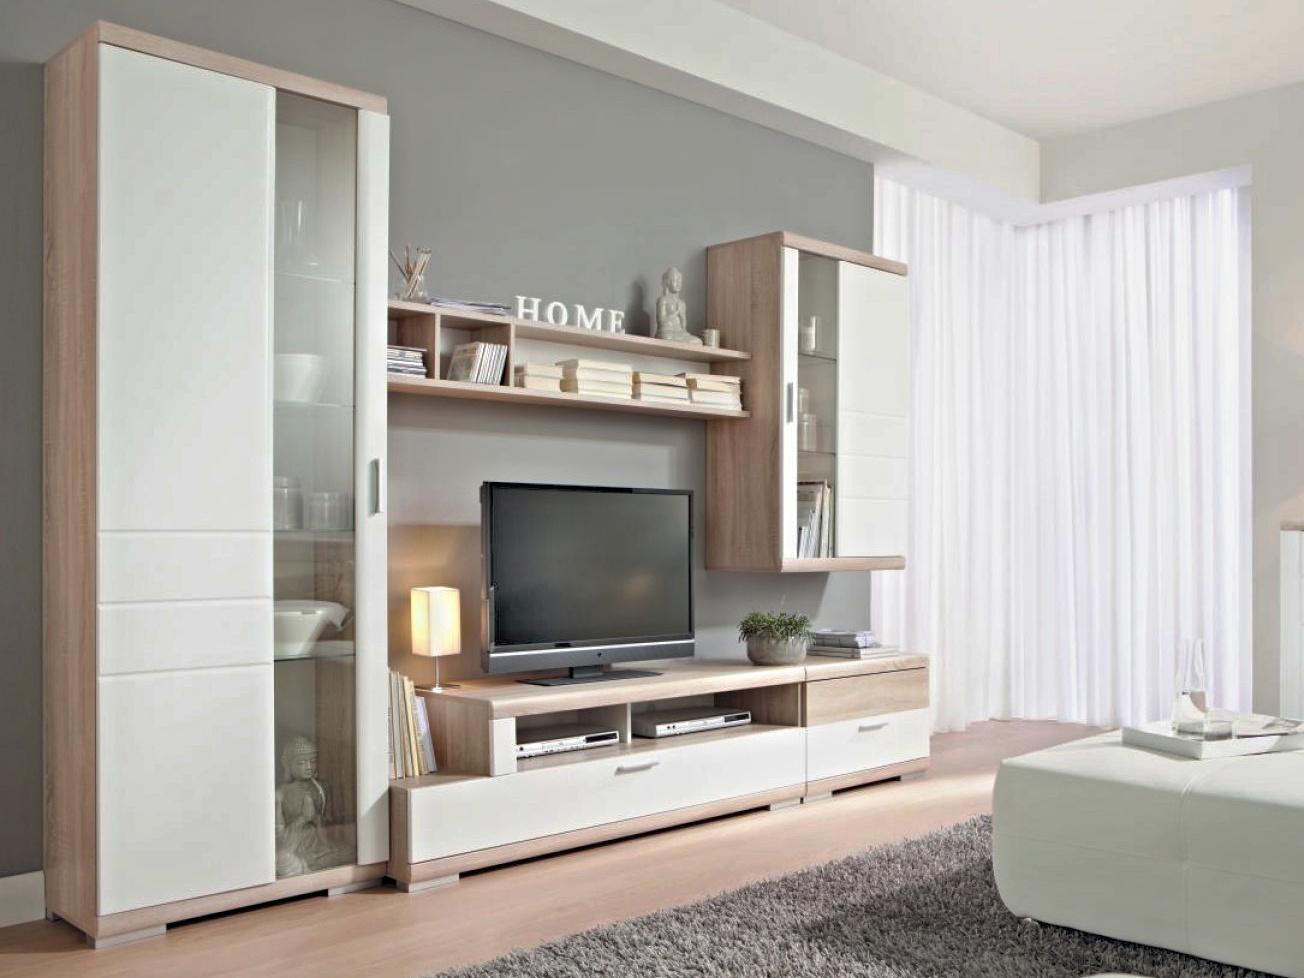 Decodom TOGGO kombi 01 obývací pokoj, dub bardolino/bílá